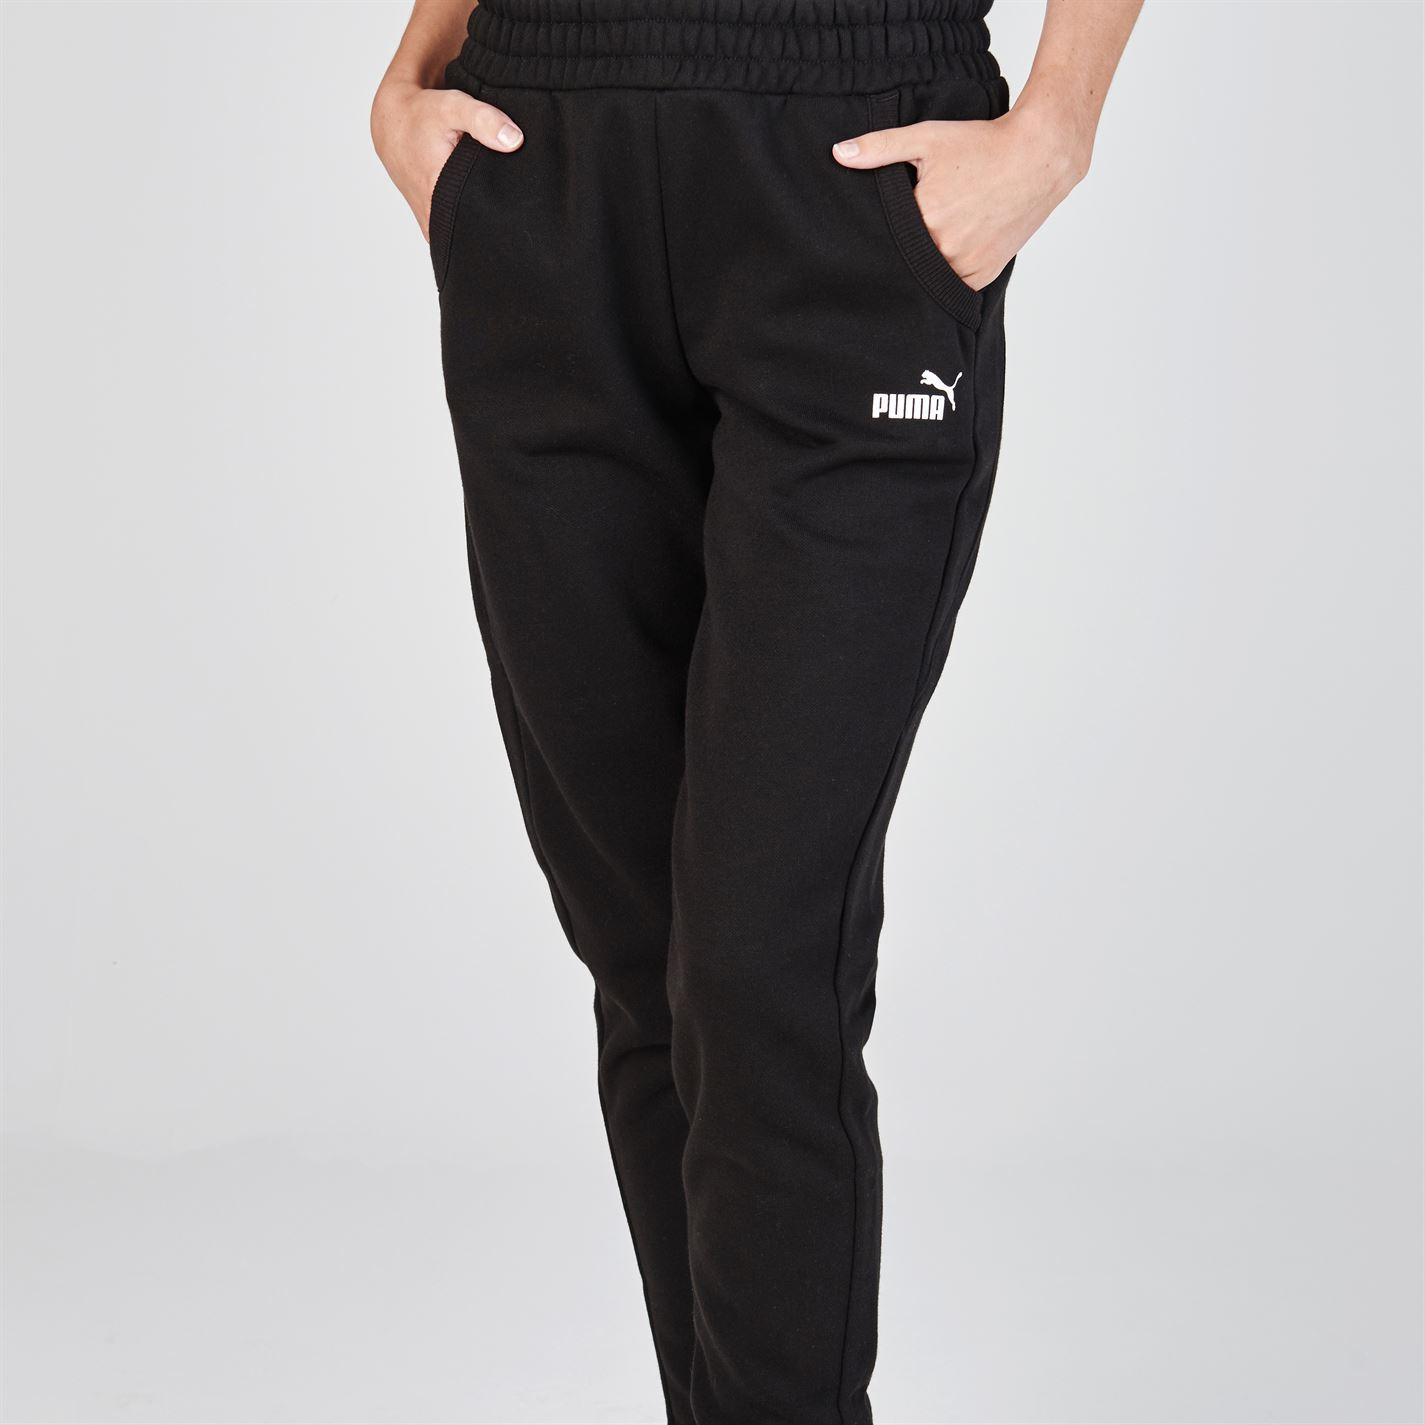 dbfc6a7ddc0c Puma Womens No1 Logo Ladies Jogging Bottoms Tracksuit Pants Trousers ...